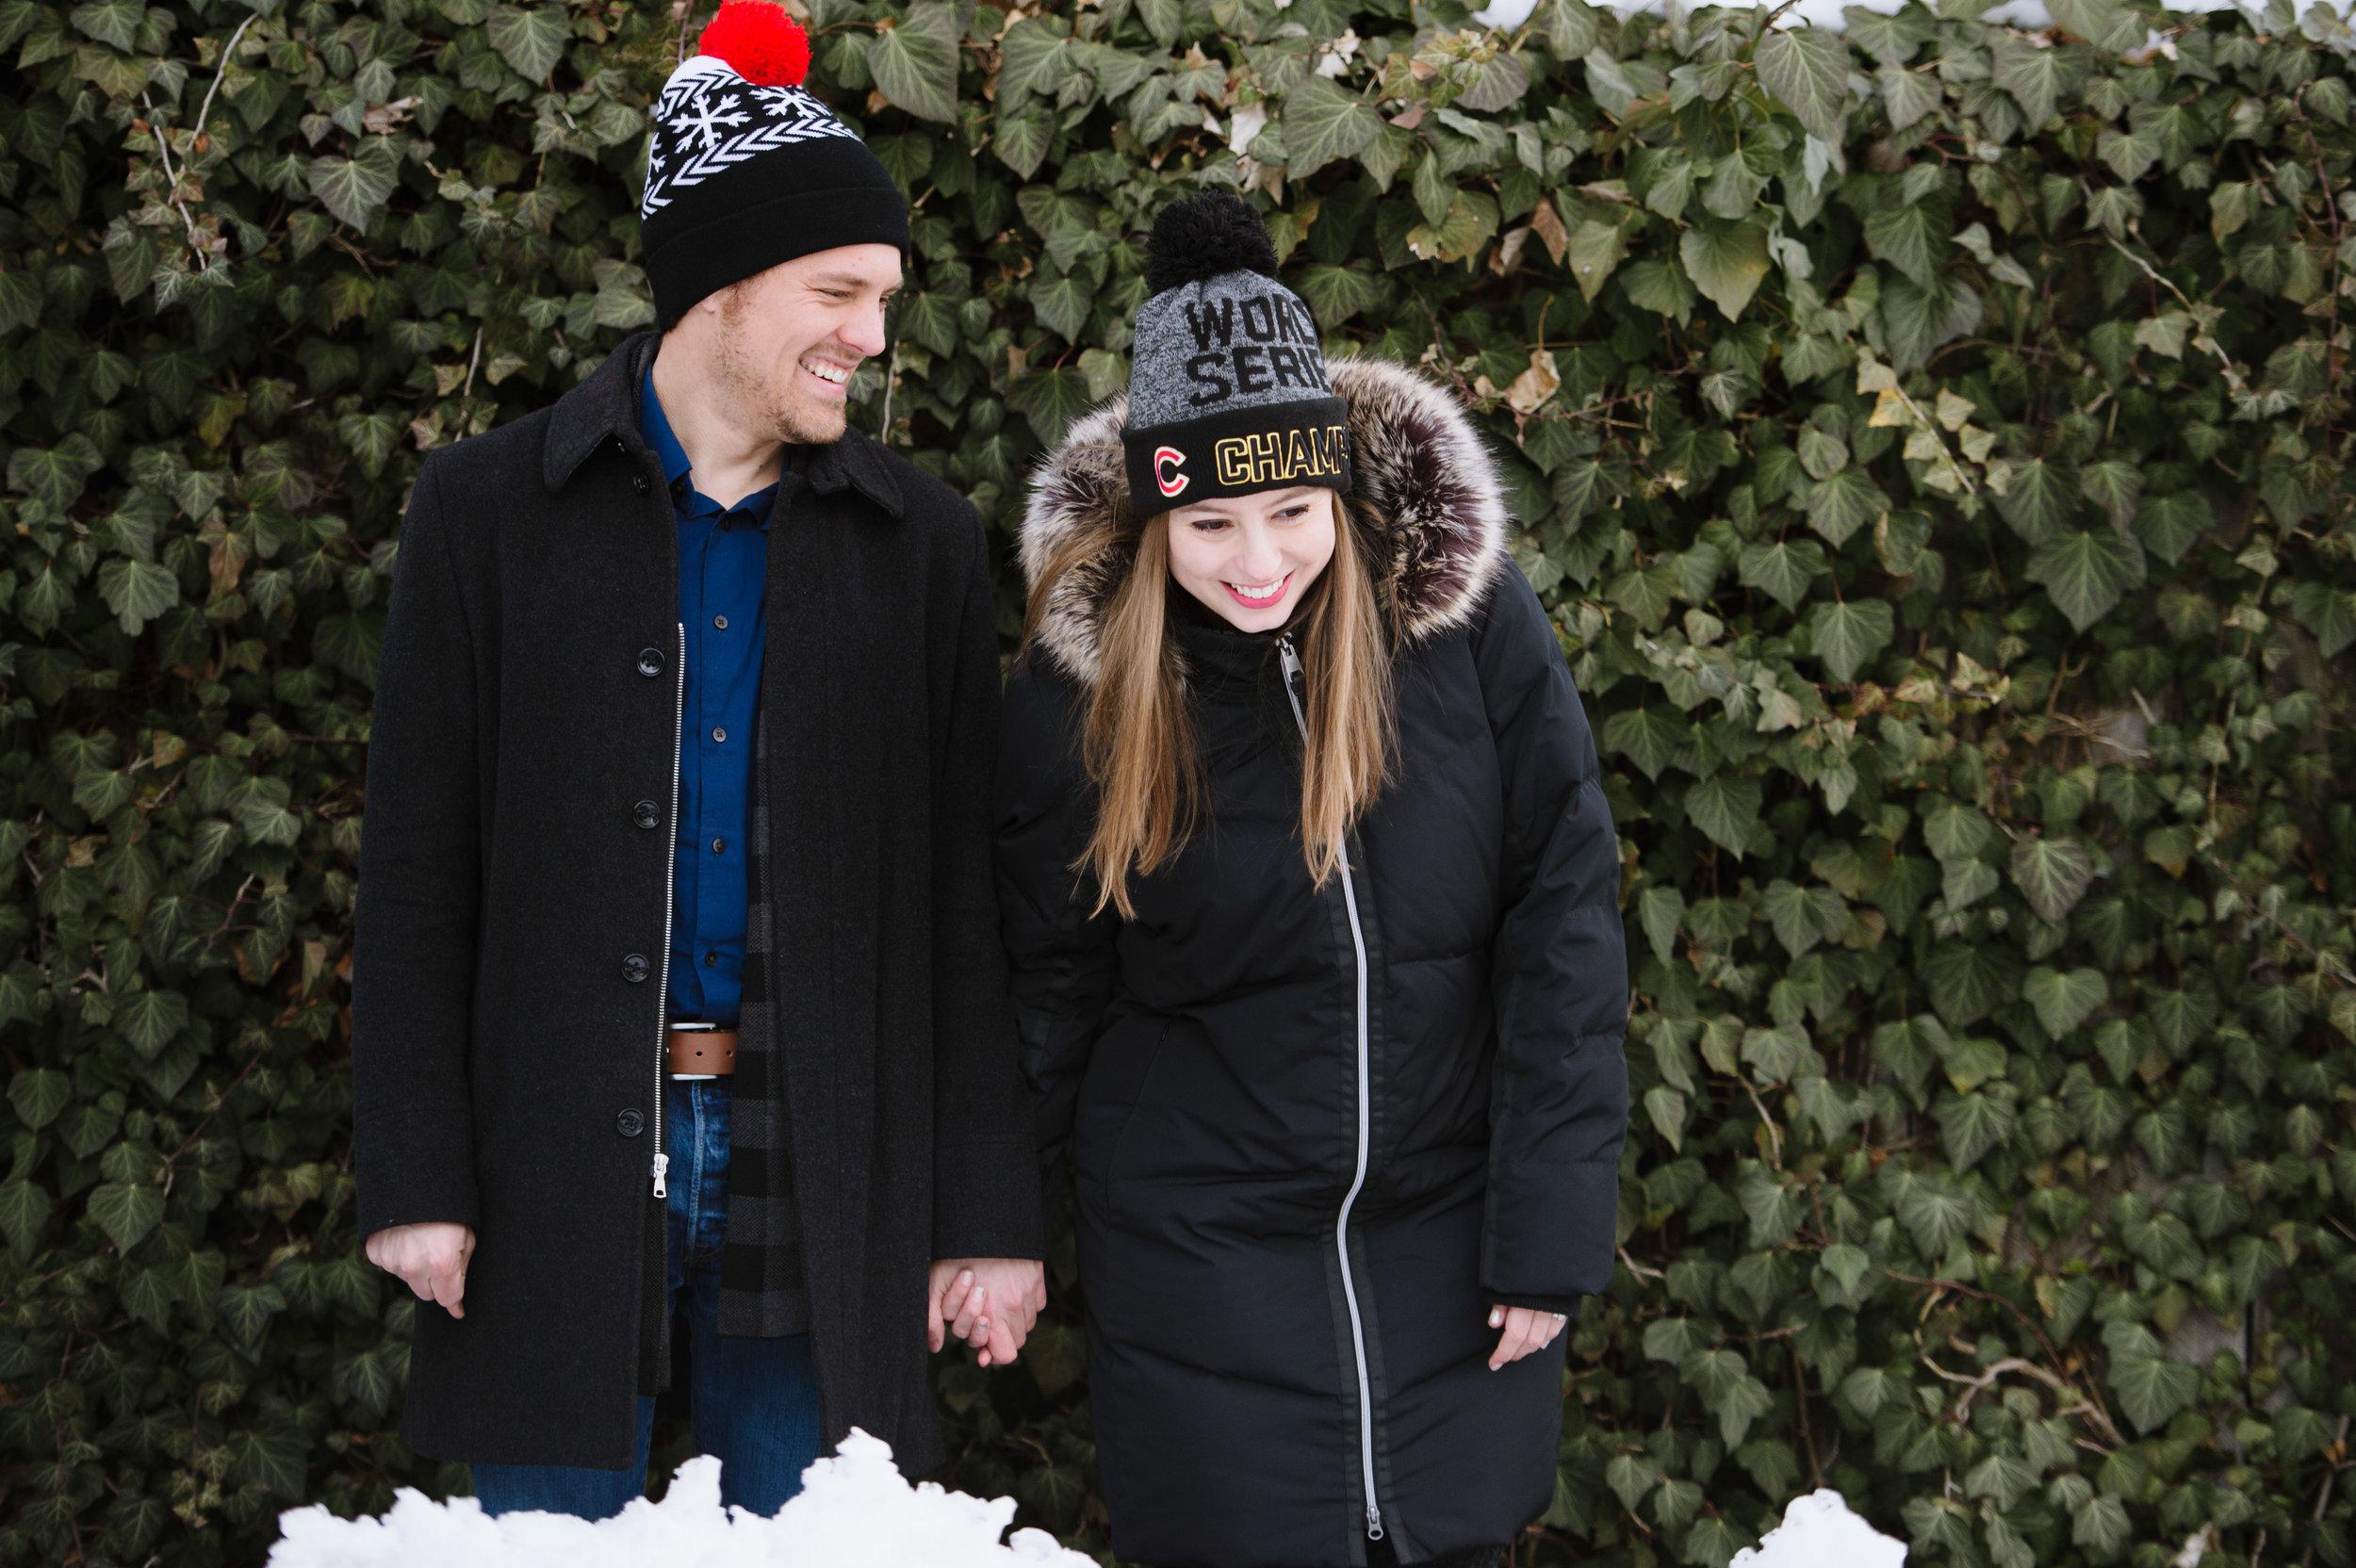 Candid-Engagement-Photos-Boston06.jpg